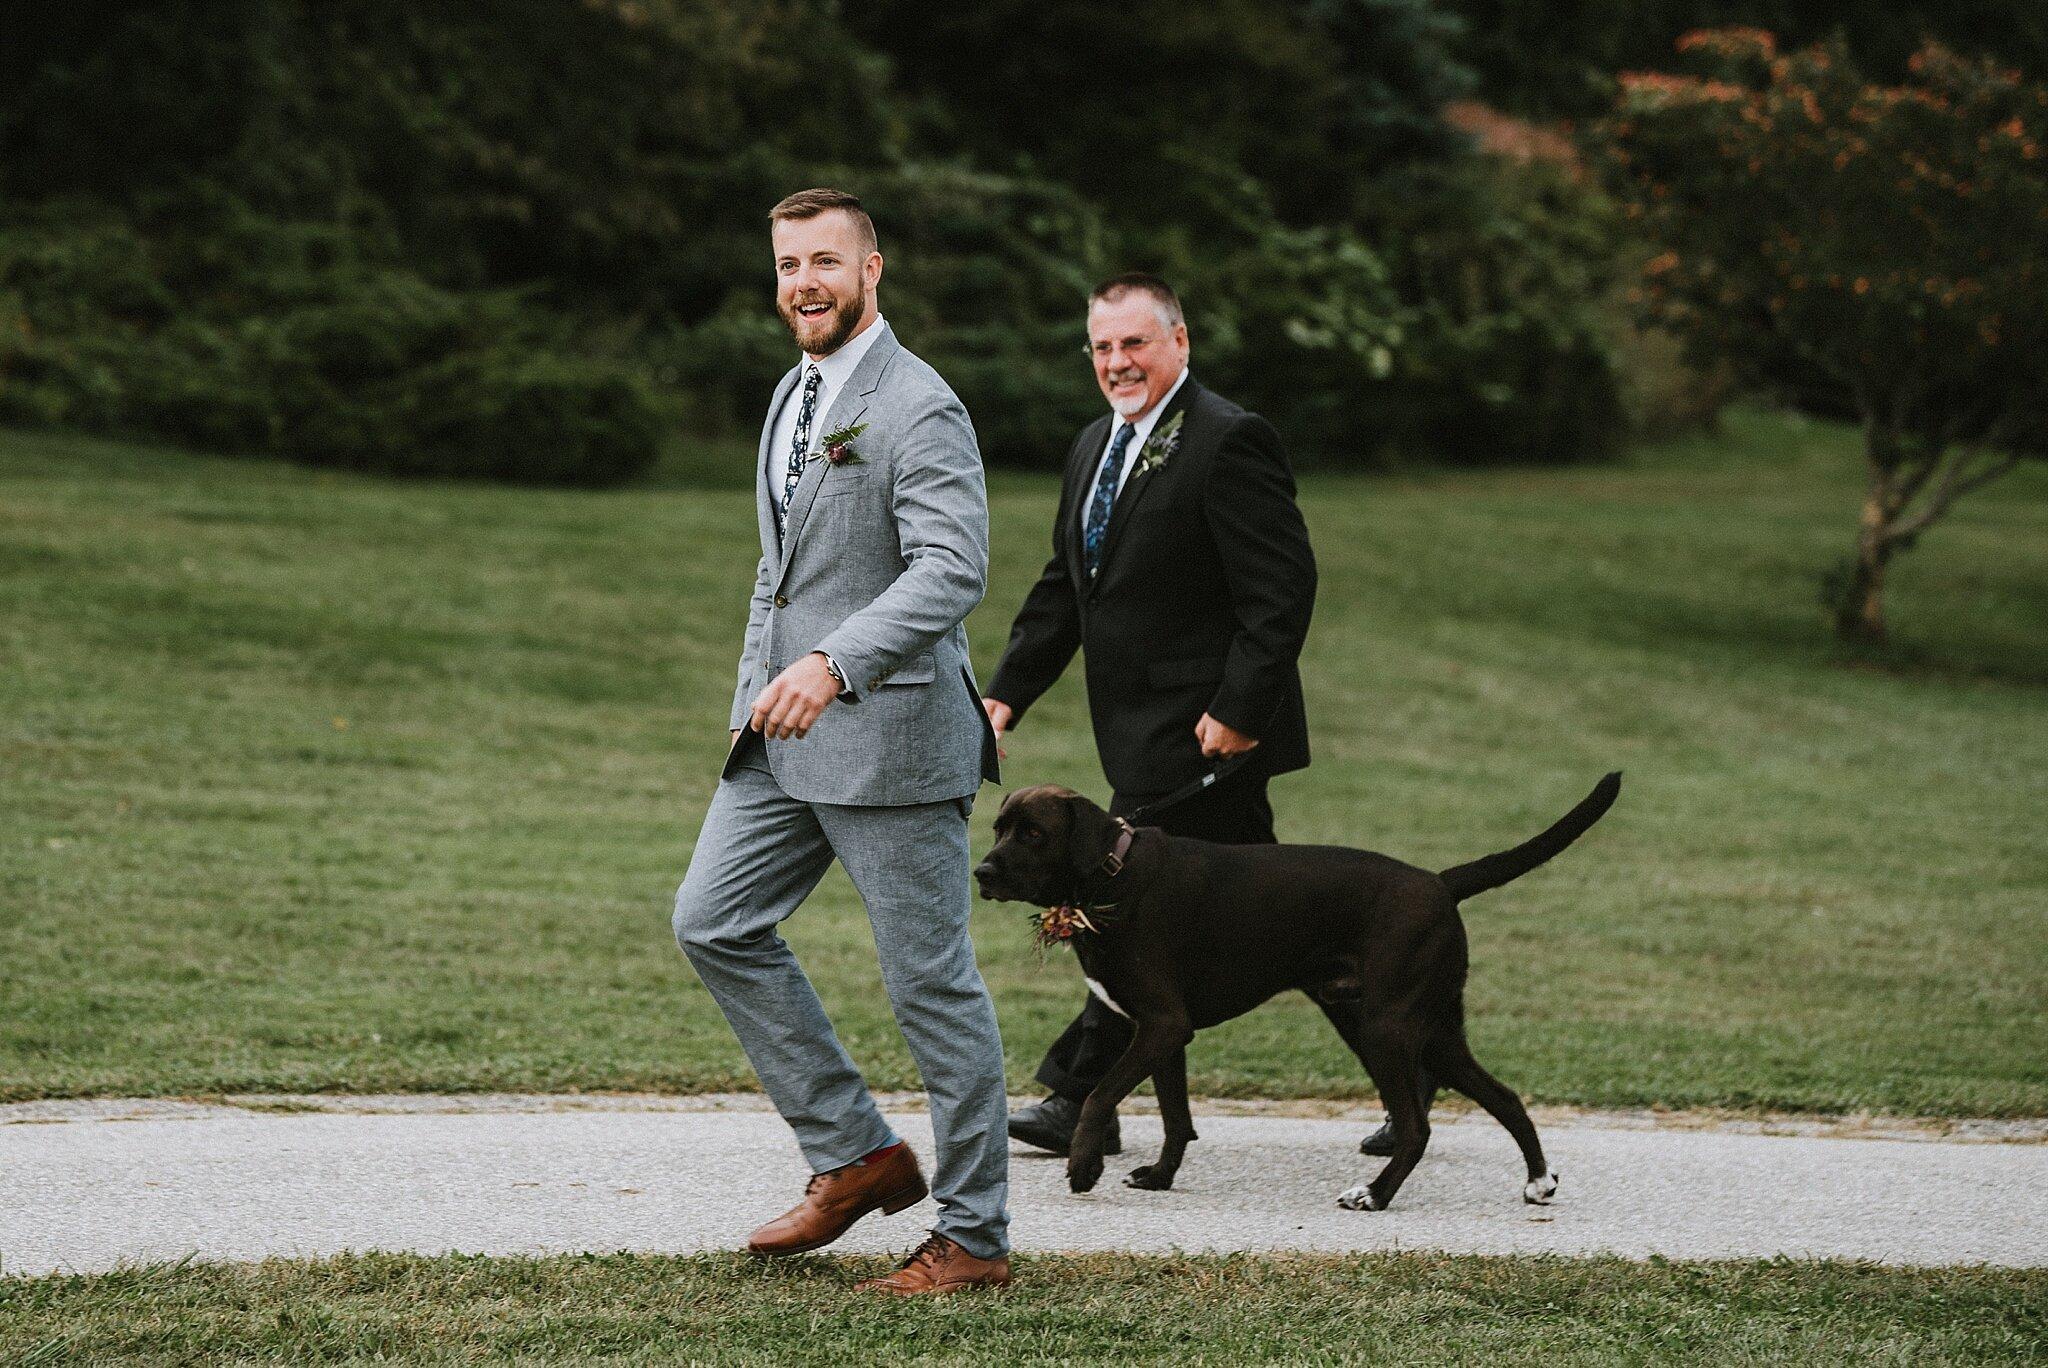 connecticut_wedding_3041.jpg